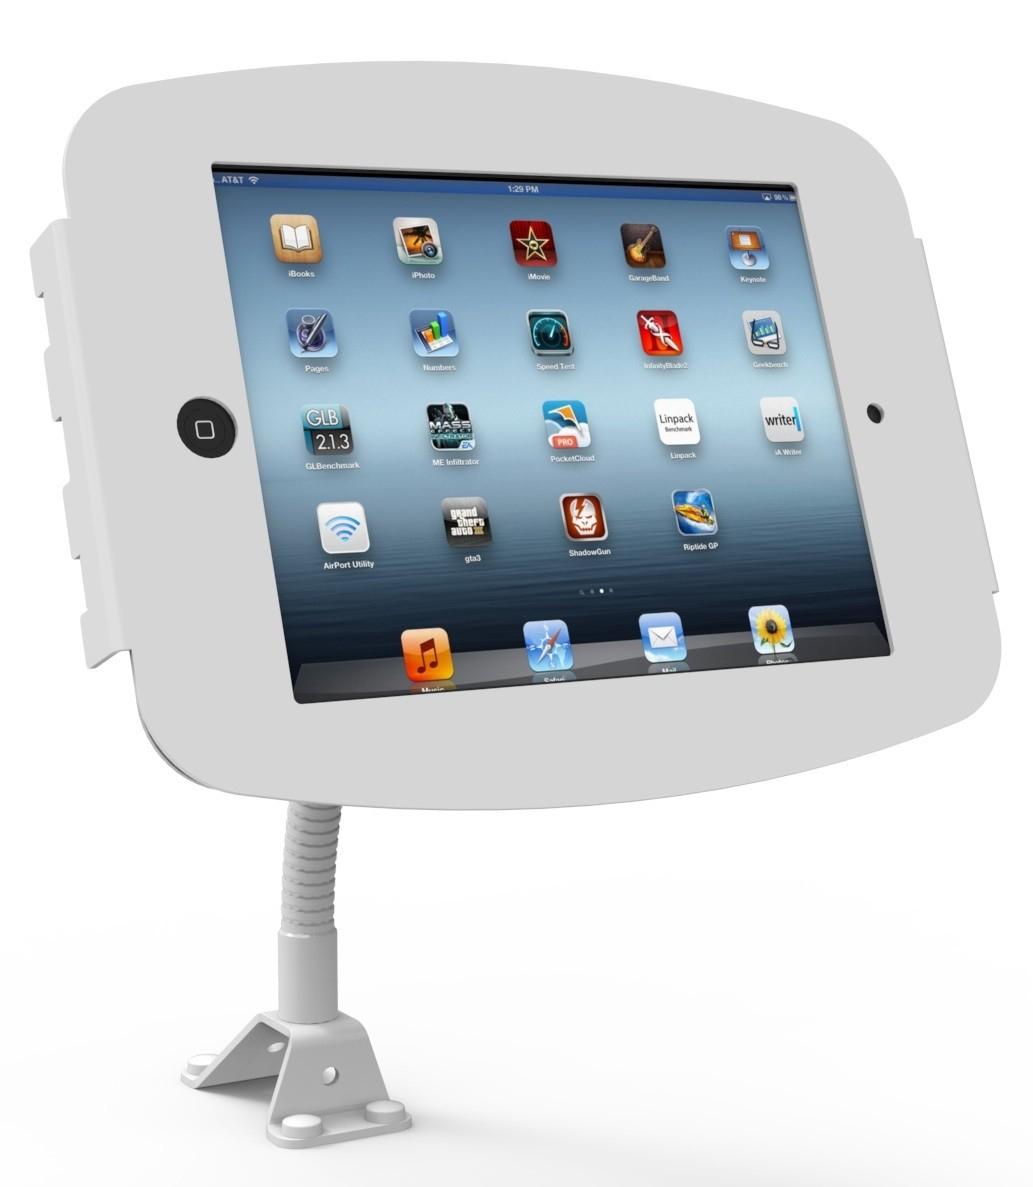 Maclocks Apple iPad 2/3/4 Mounting Kit - Mount, Anti-Theft Enclosure, Flexible Arm, White